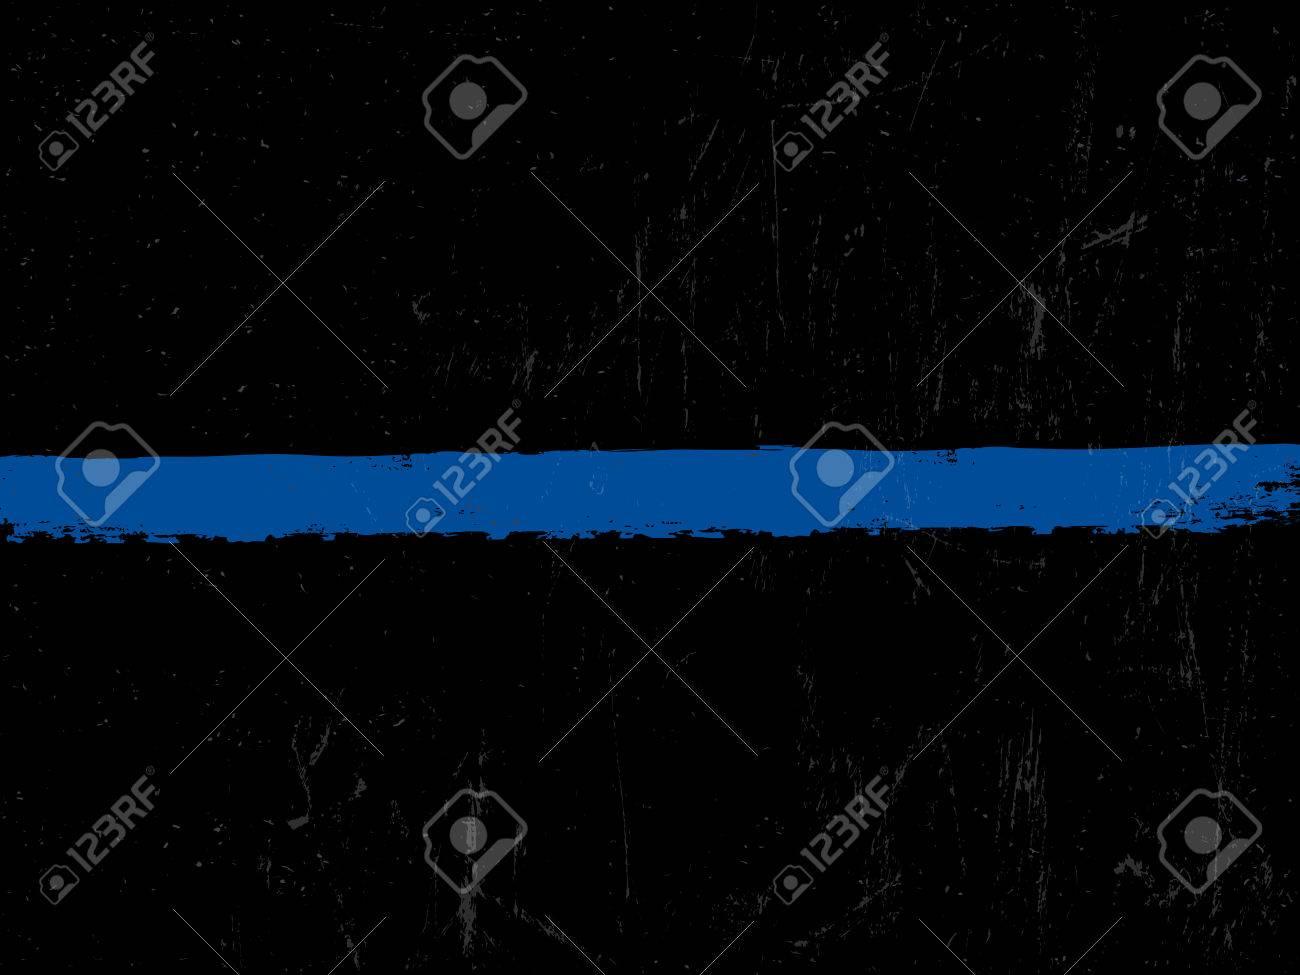 The Thin Blue Line. Police symbol. - 65265738